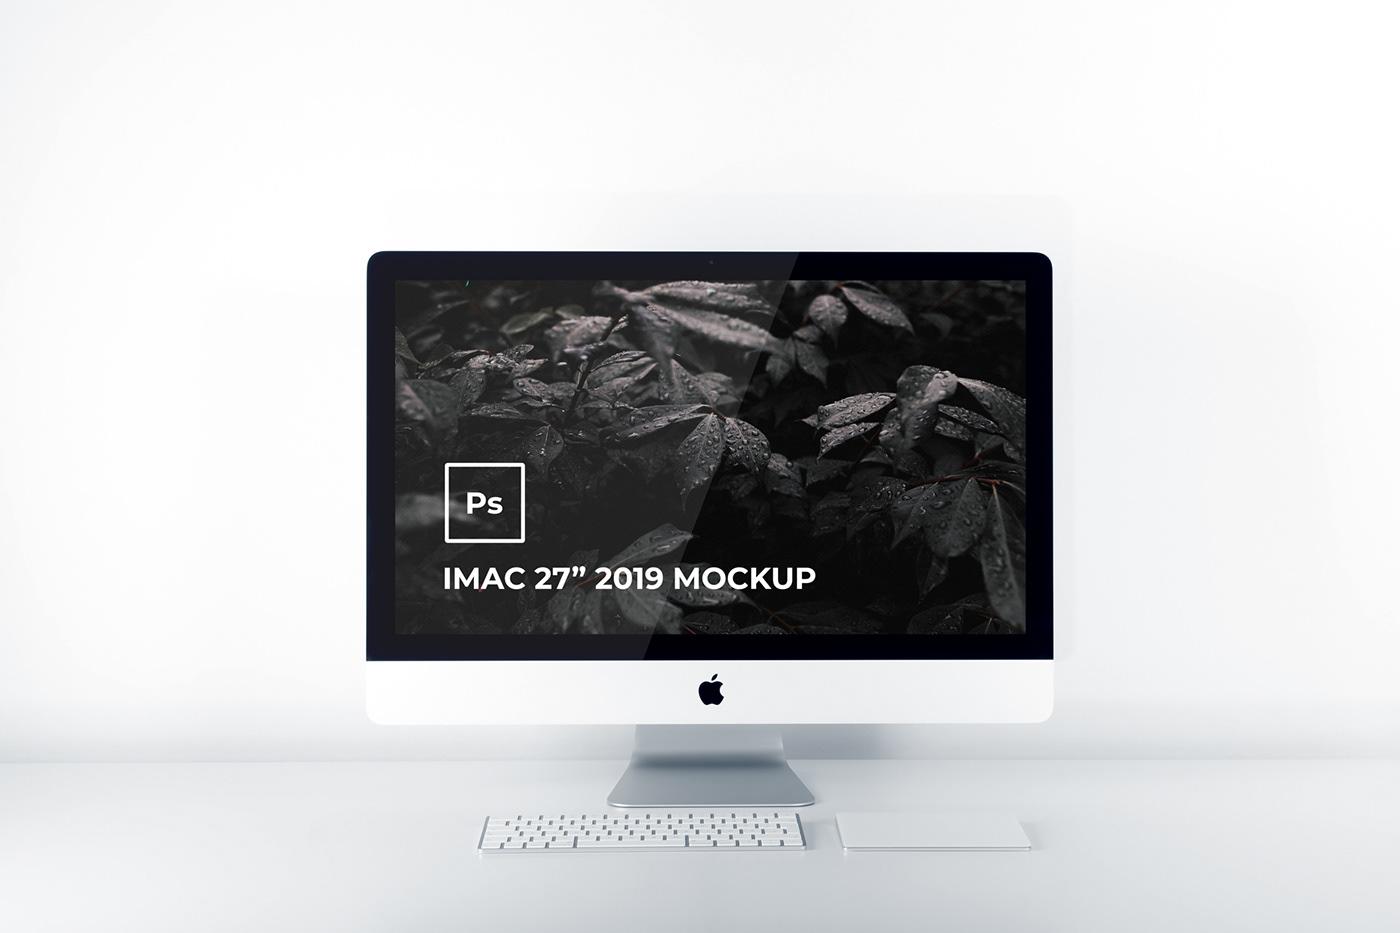 "photoshop mockup free mockup  imac 2019 modern mockup imac 27"" mockup minimalist mockup"